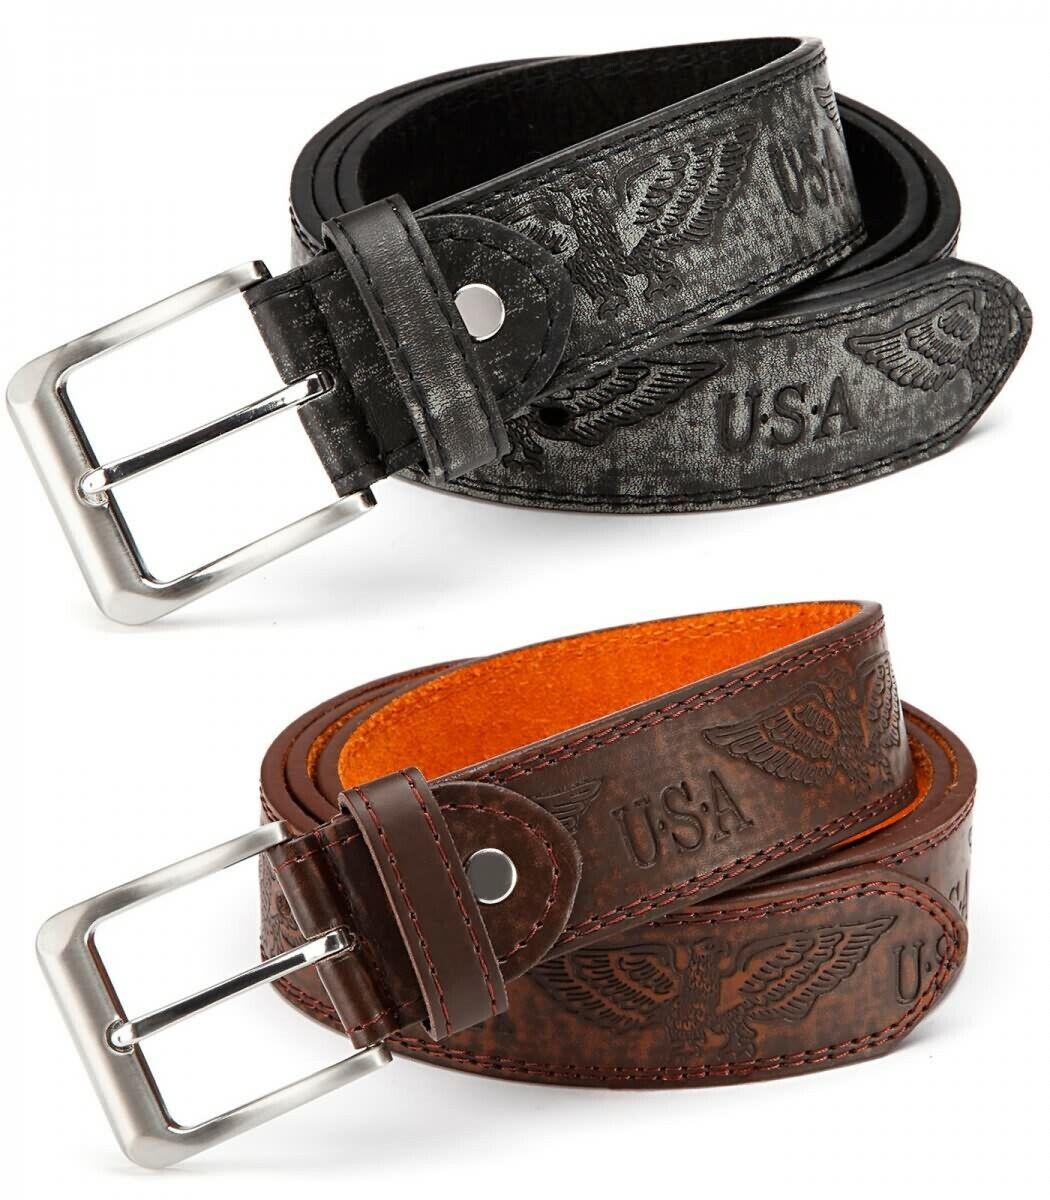 Mens Jeans Suit Belt Men buckle removable belt Belt Strap Belts g79